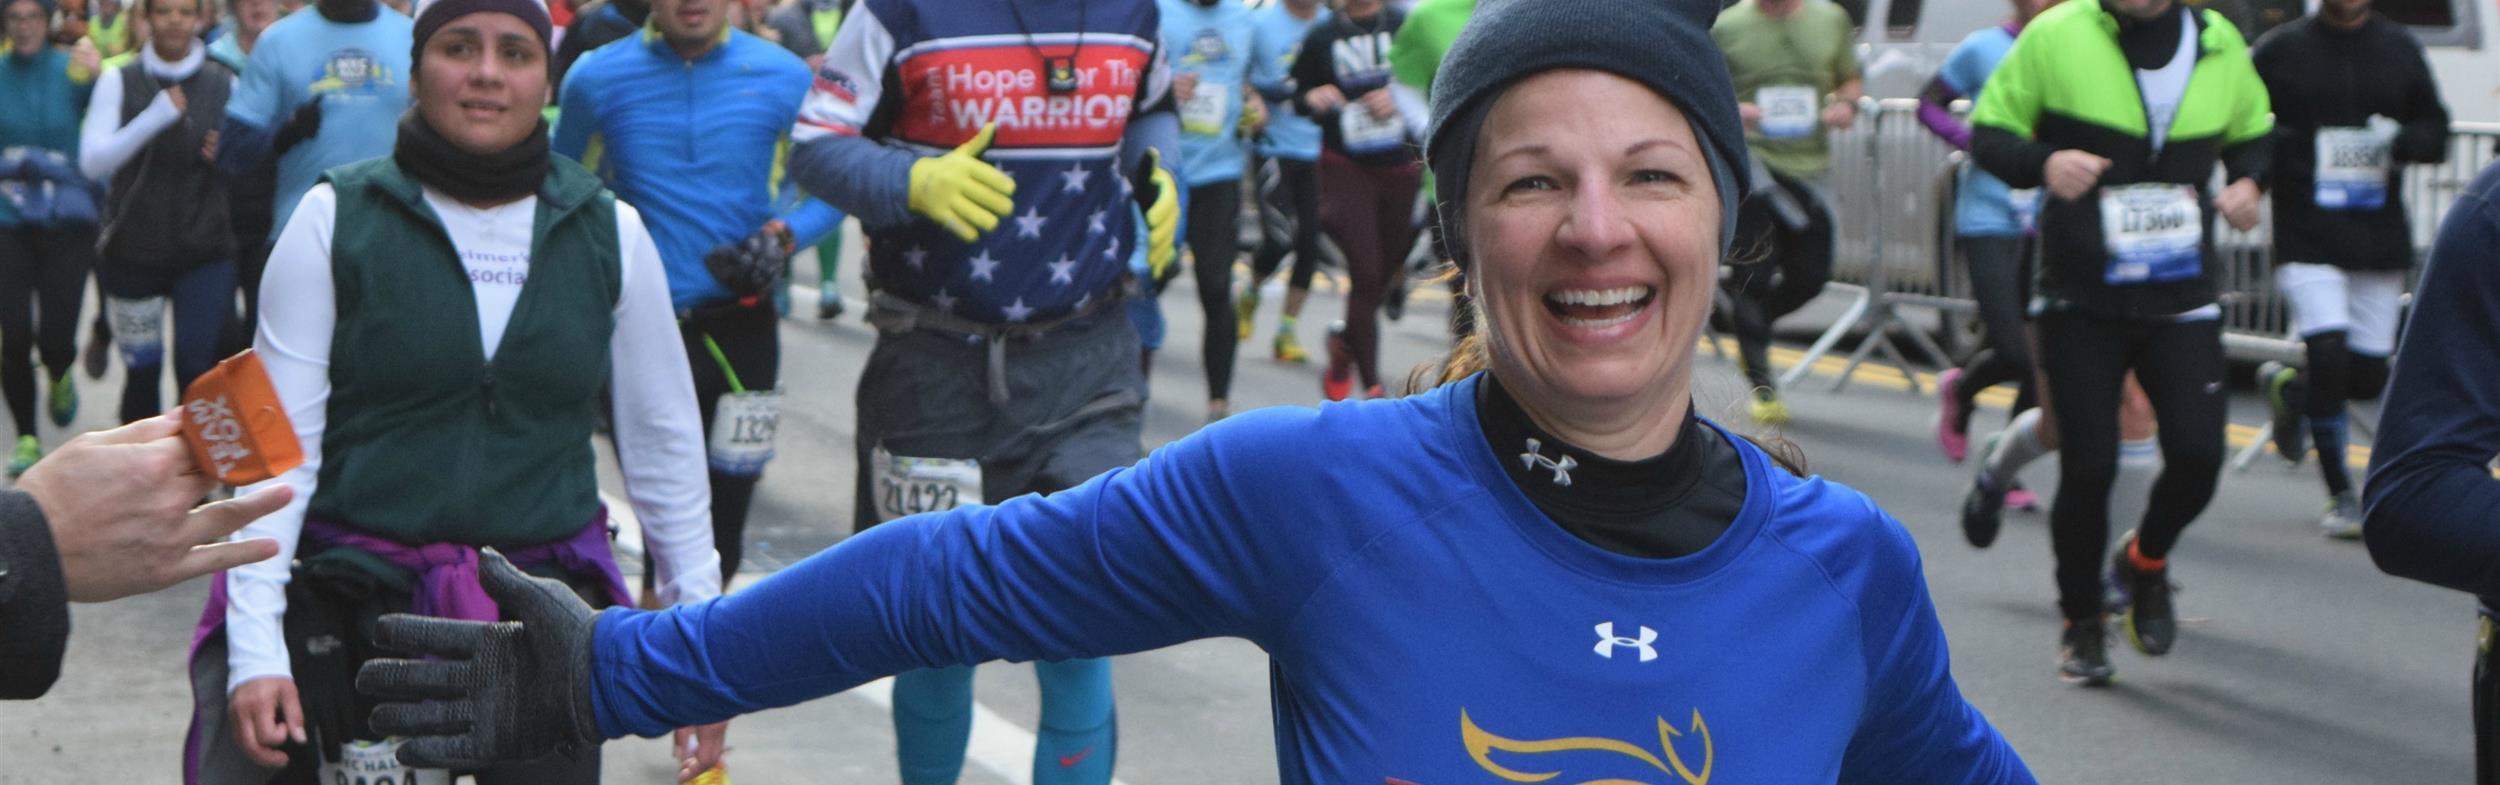 NYC Half Marathon 2018